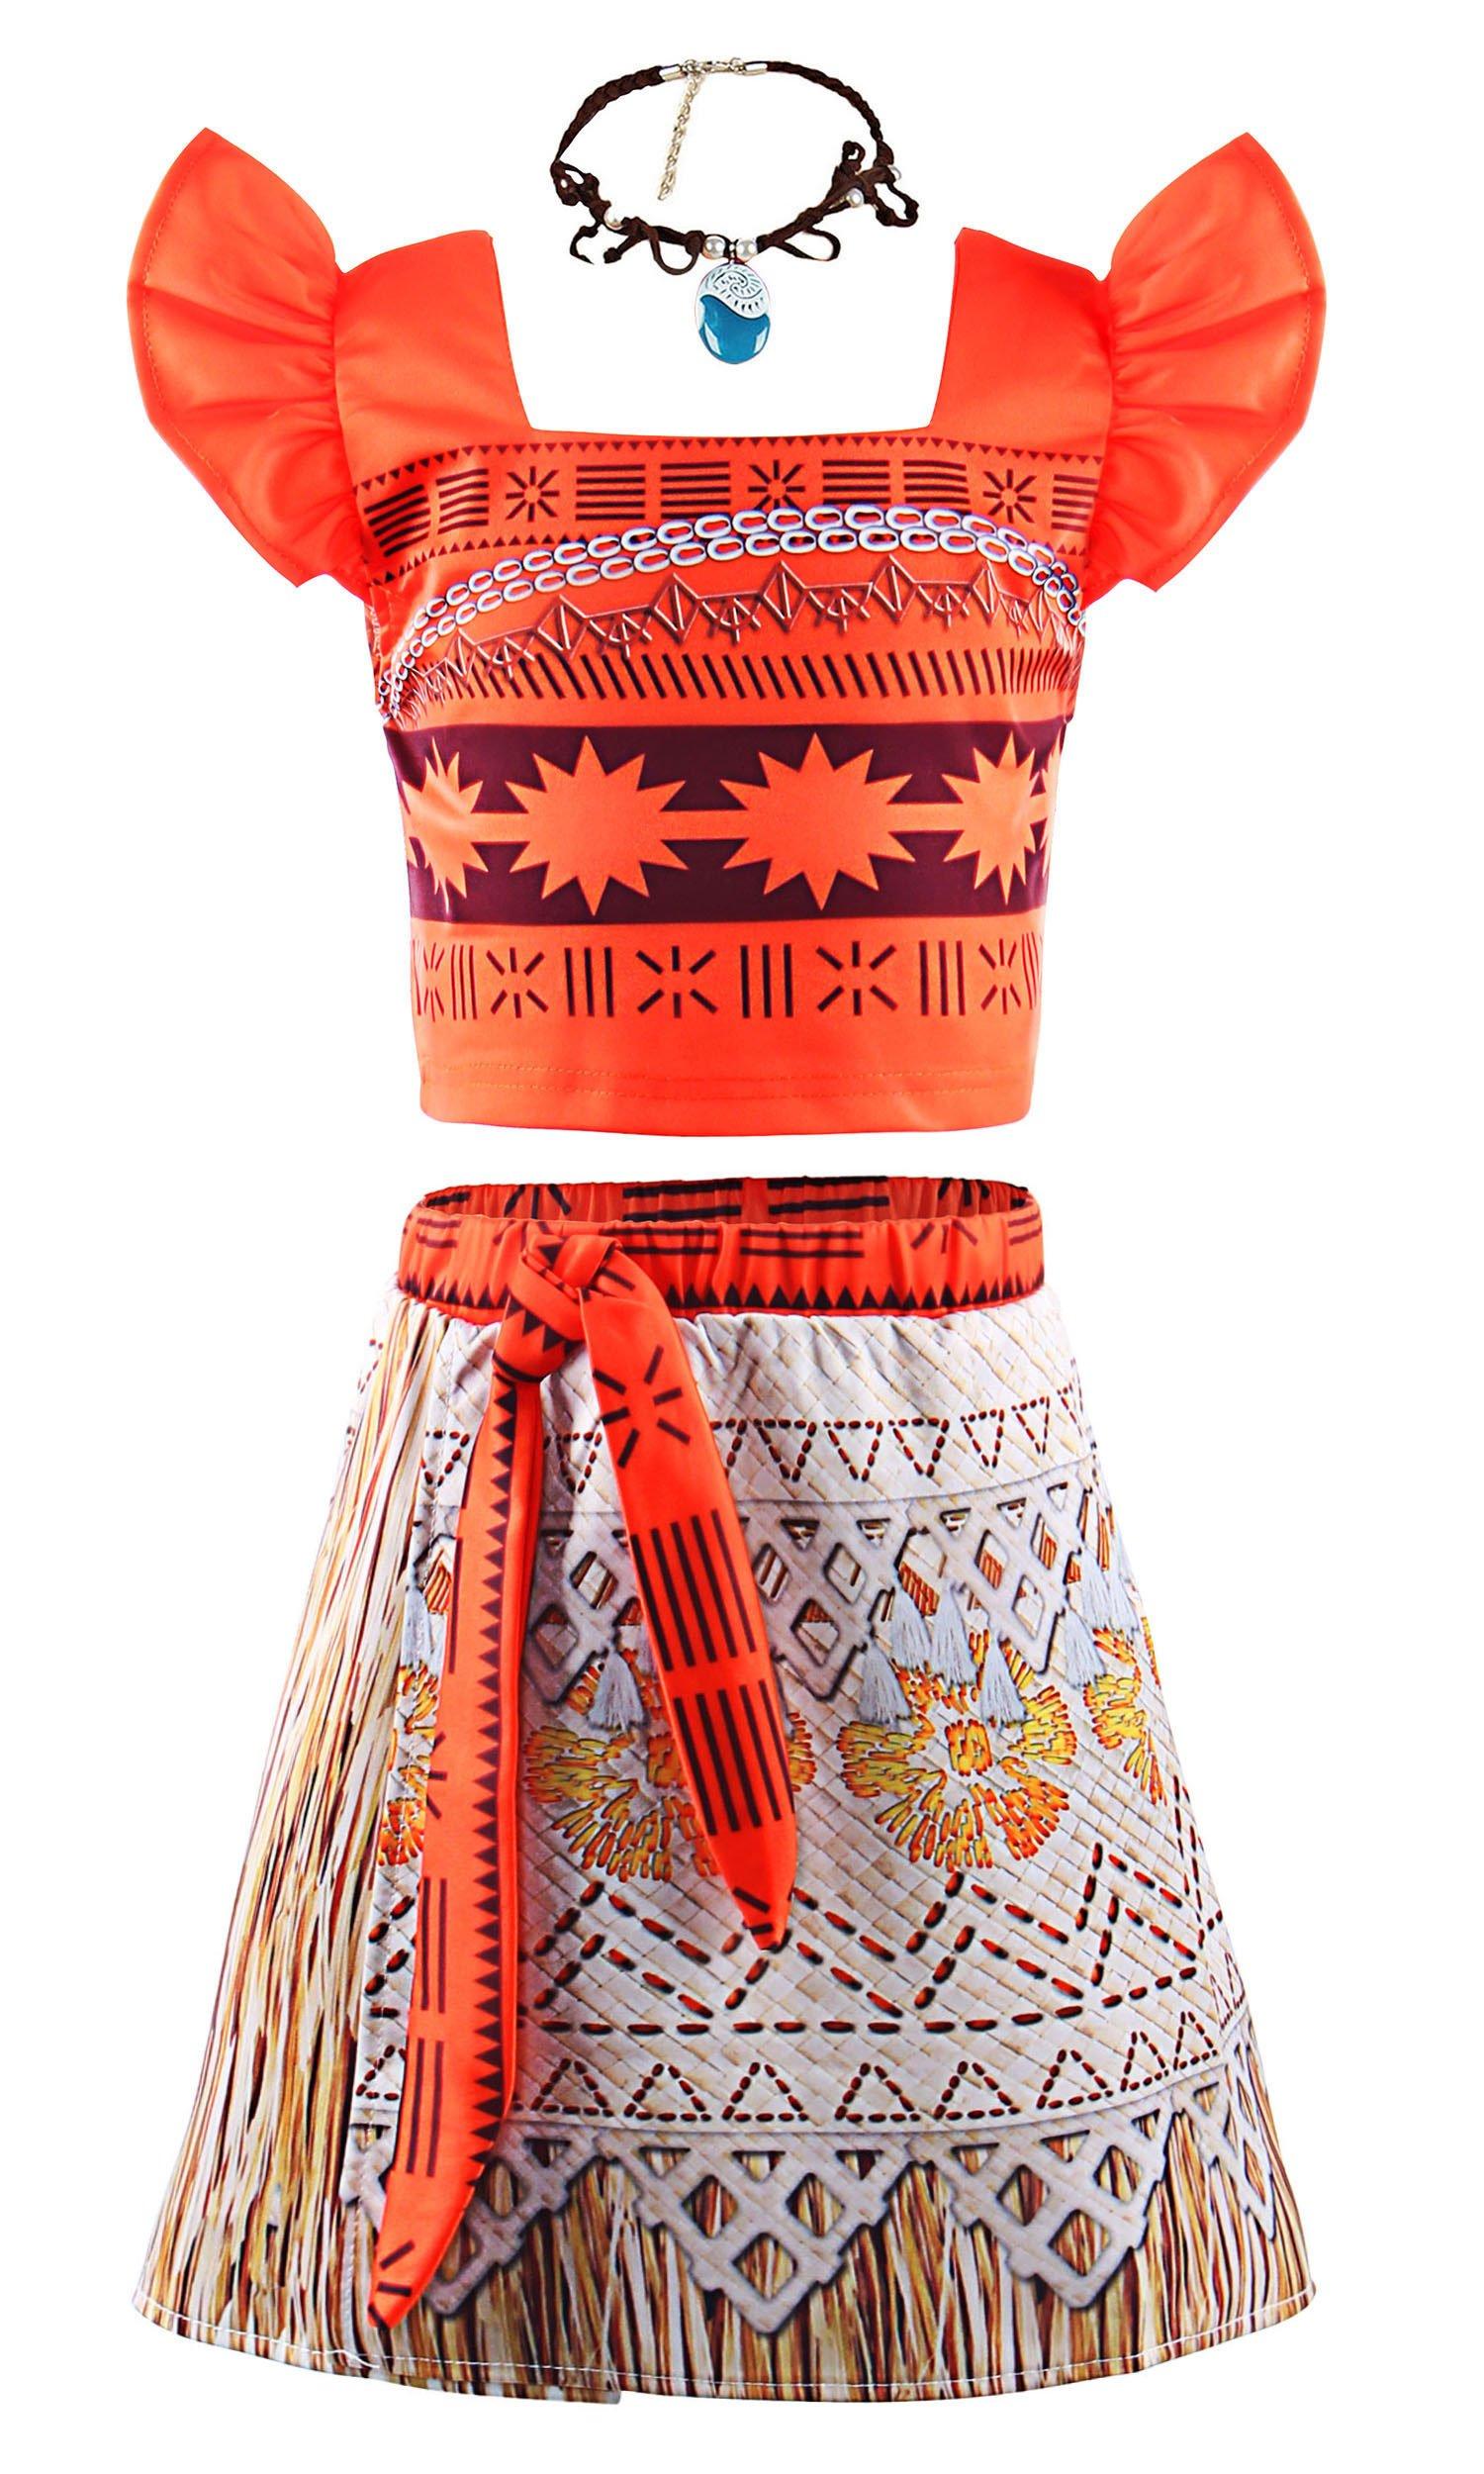 JerrisApparel Princess Moana Costume Two-Piece Skirt Set Dress up for Girls (5-6, Orange)